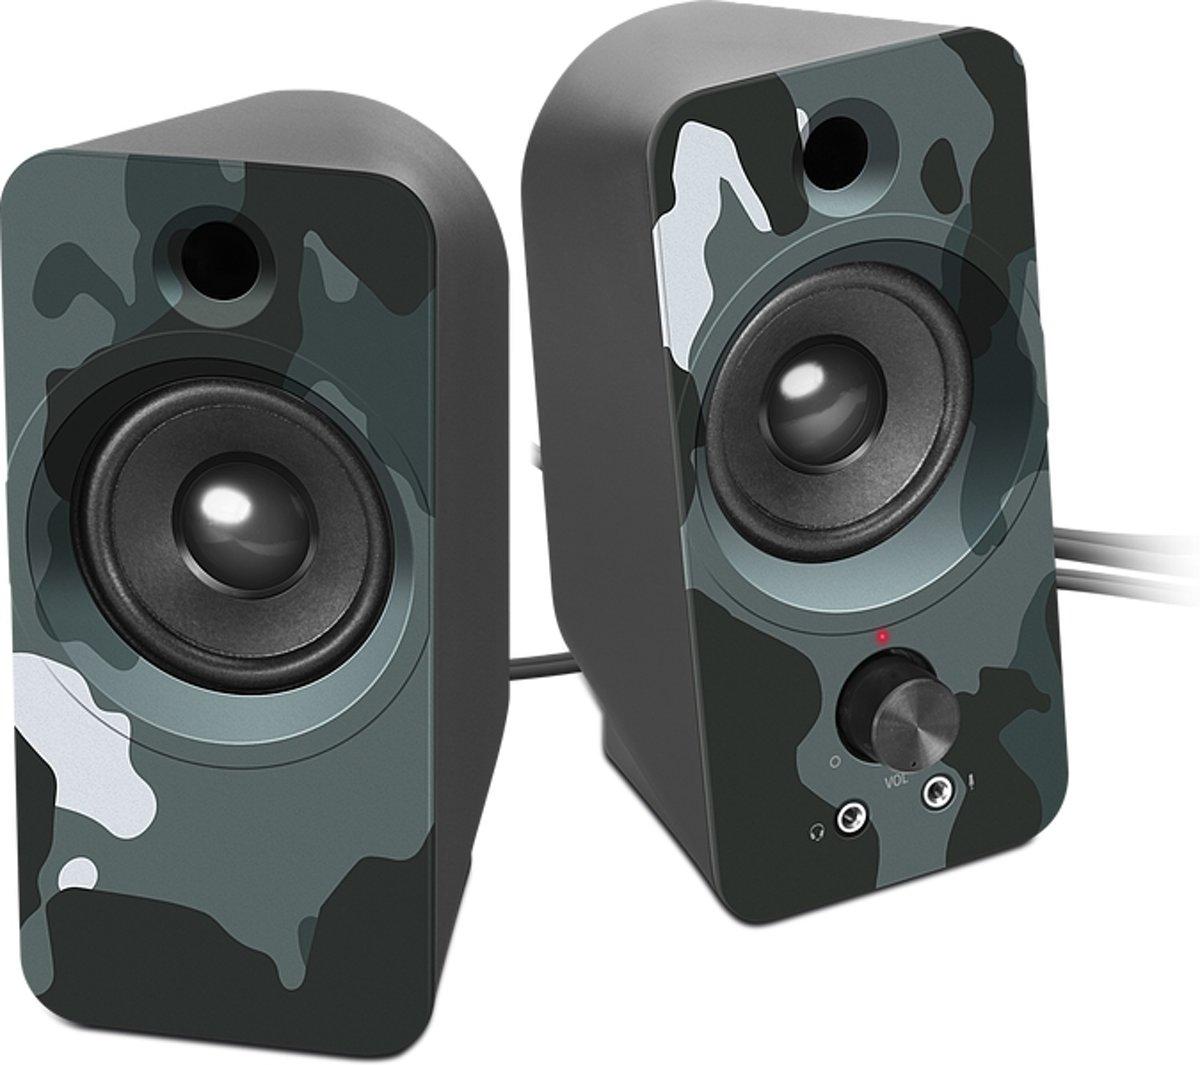 Speedlink Daroc Stereo Speaker - Blauw Camouflage kopen